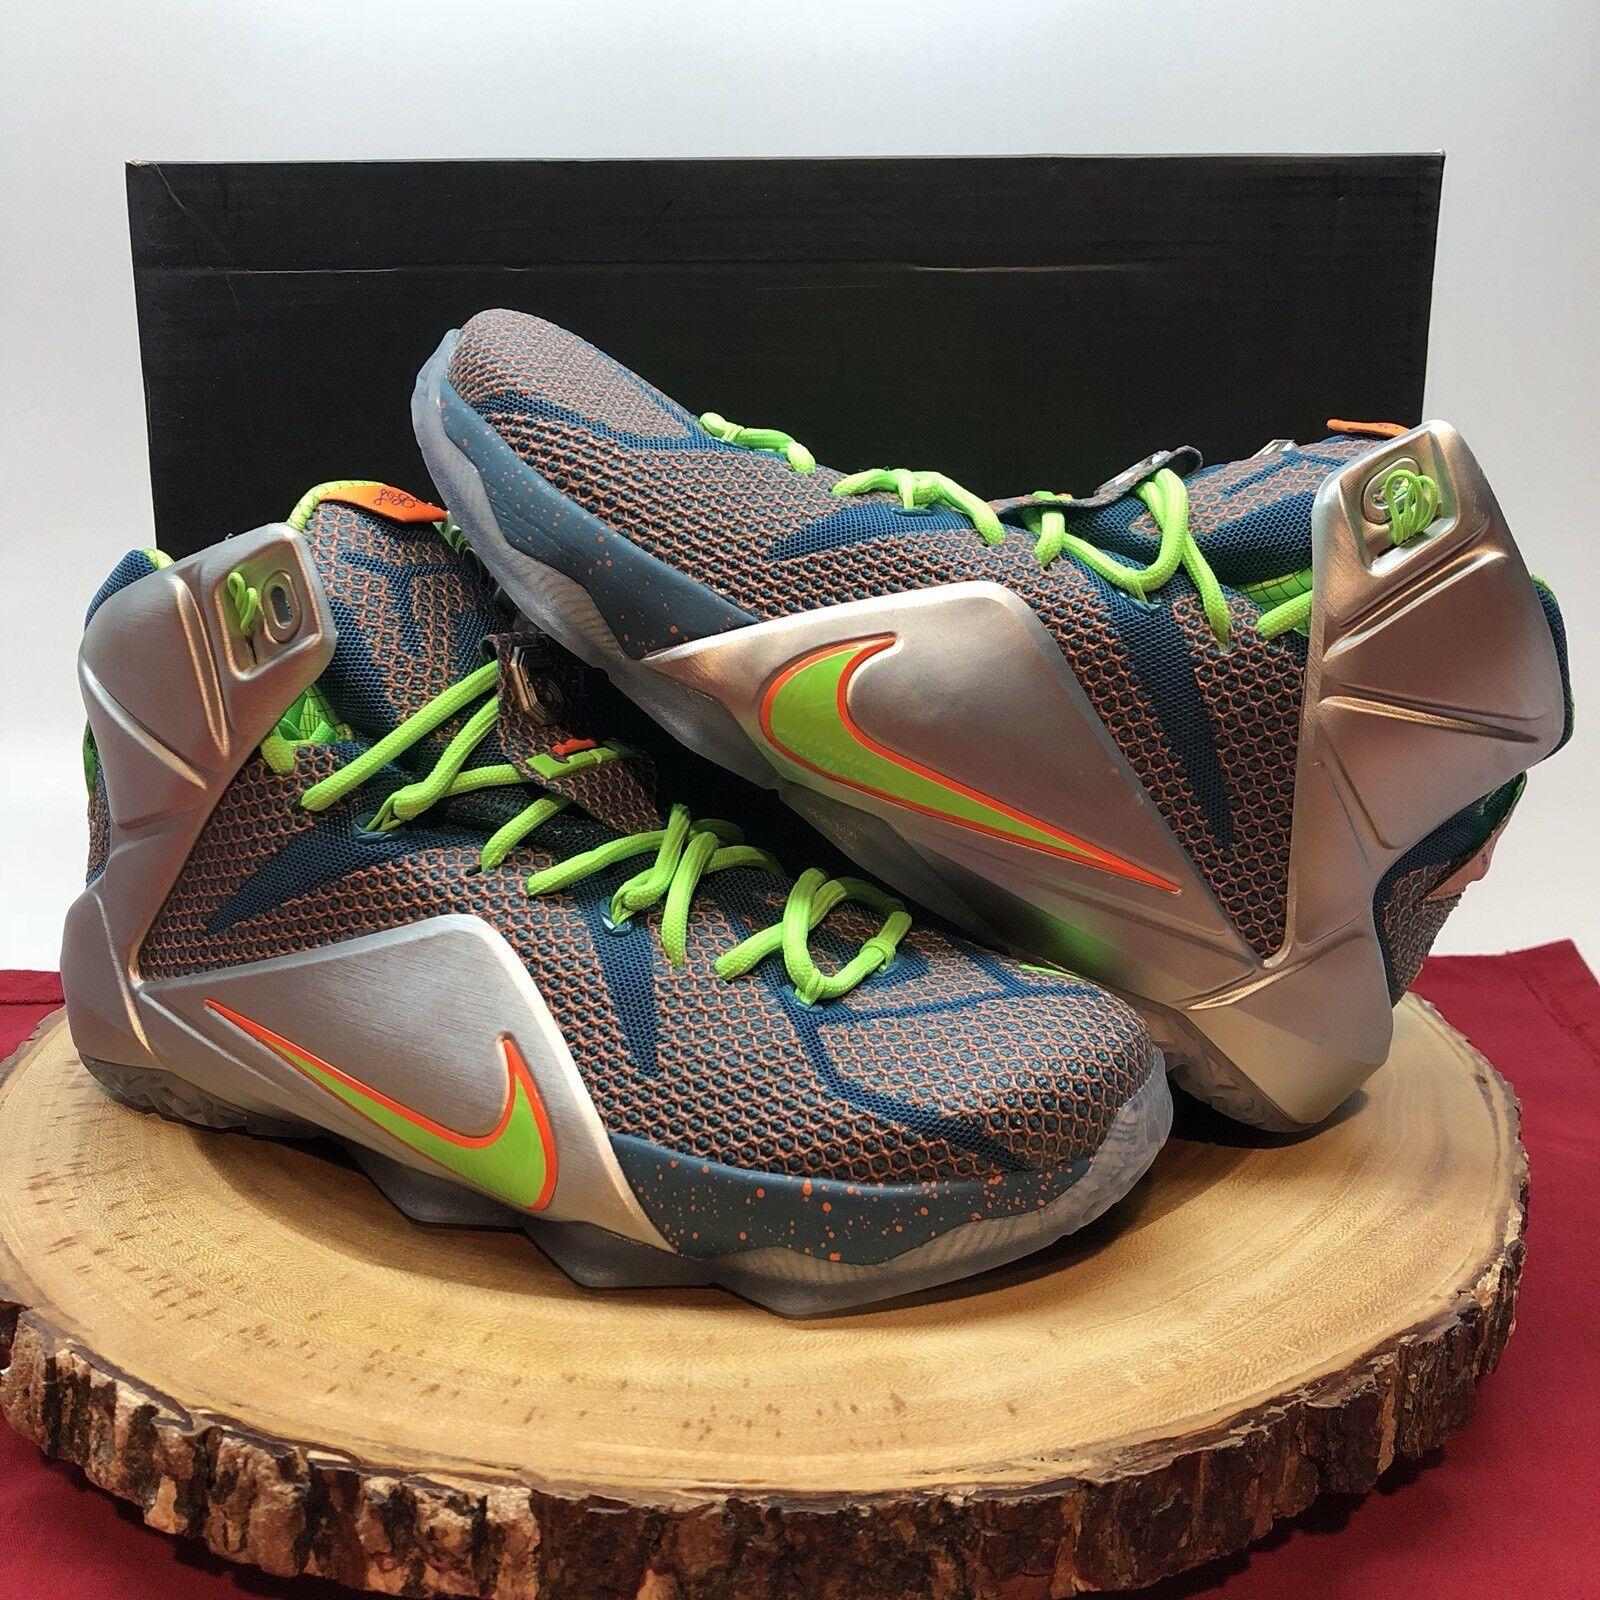 Nike Lebron XII PRM Trillion Dollar Man Riftblue Metallic Silver 705410 430 8.5